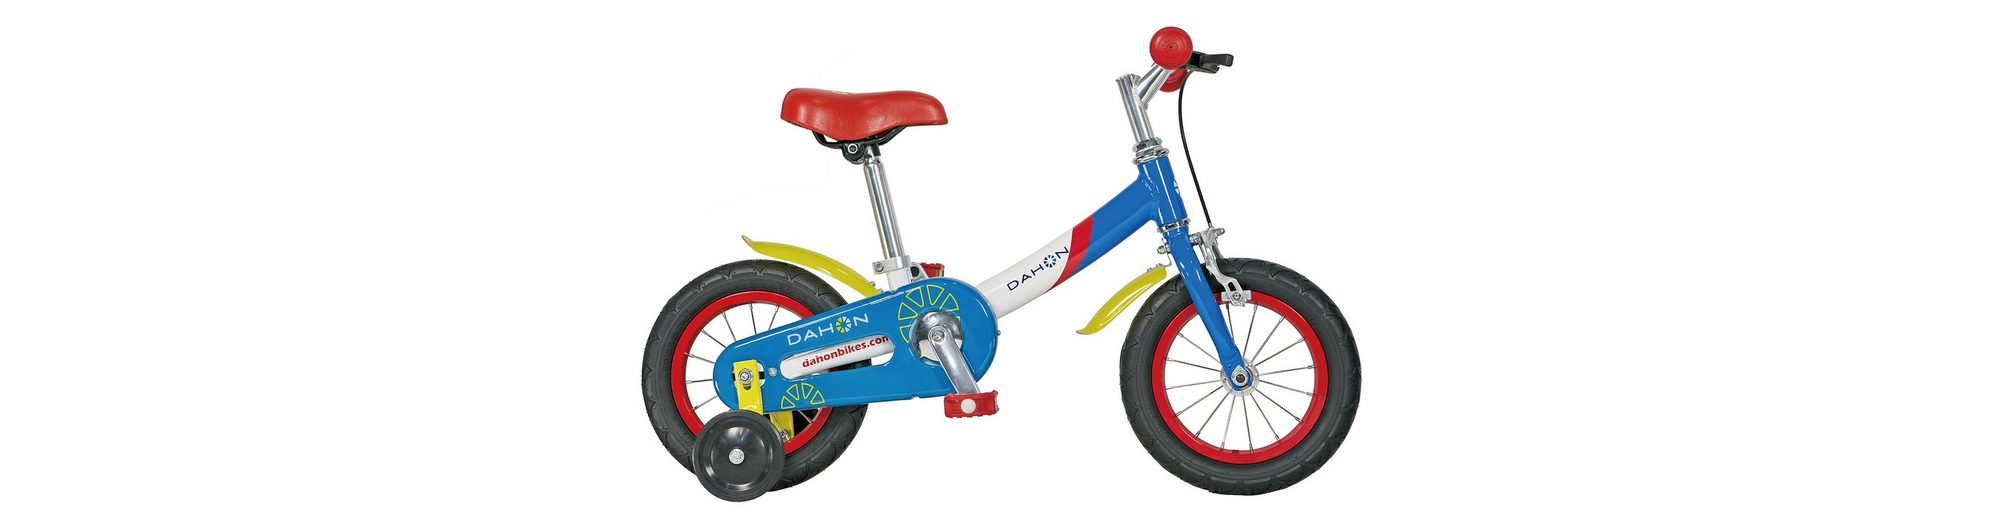 Kinderfahrrad, 12 Zoll, 1 Gang, blau-rot-weiss, »Kids Bike«, Dahon